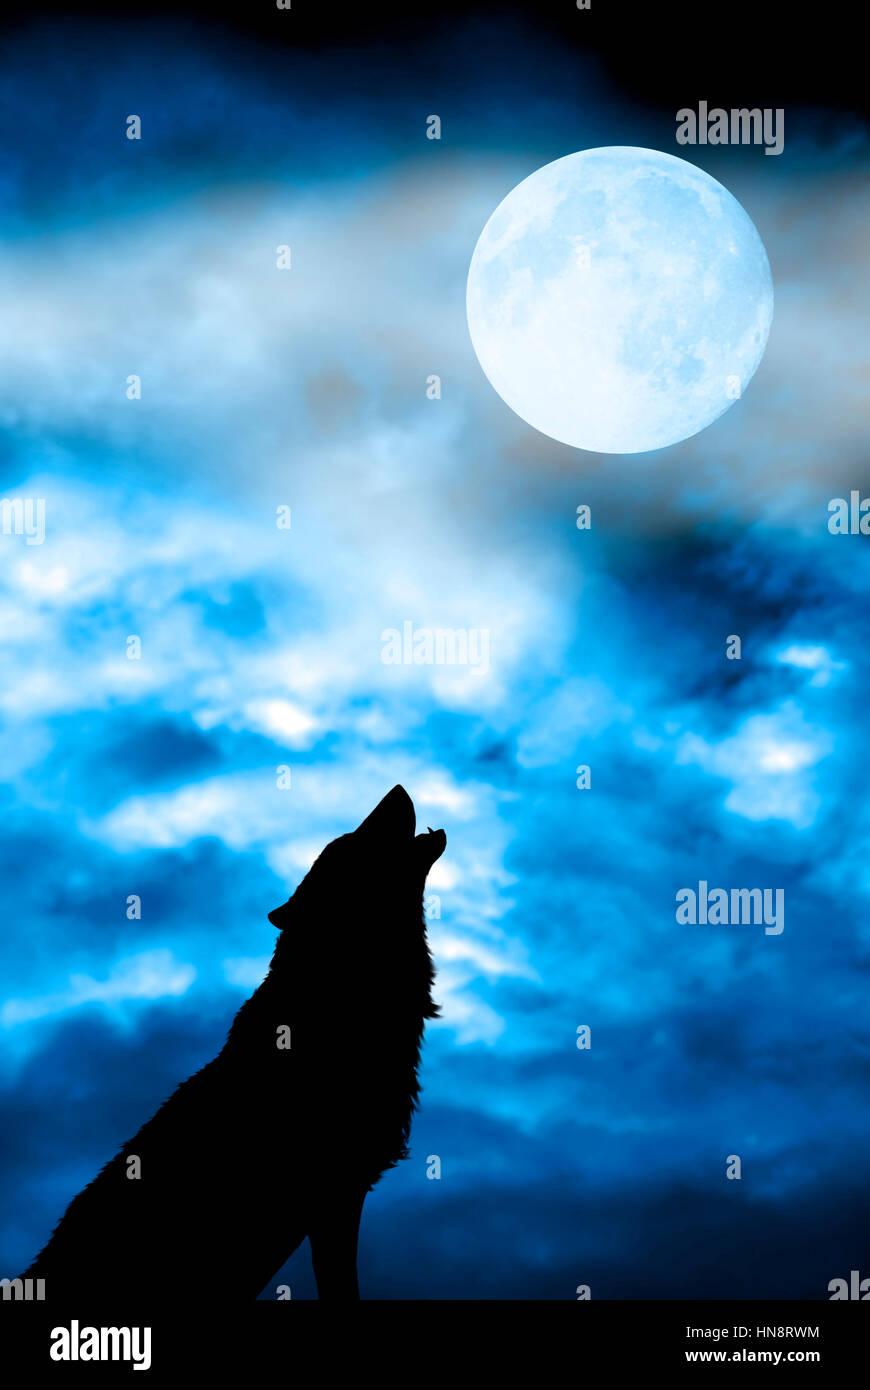 Howl At The Moon Imágenes De Stock Howl At The Moon Fotos De Stock